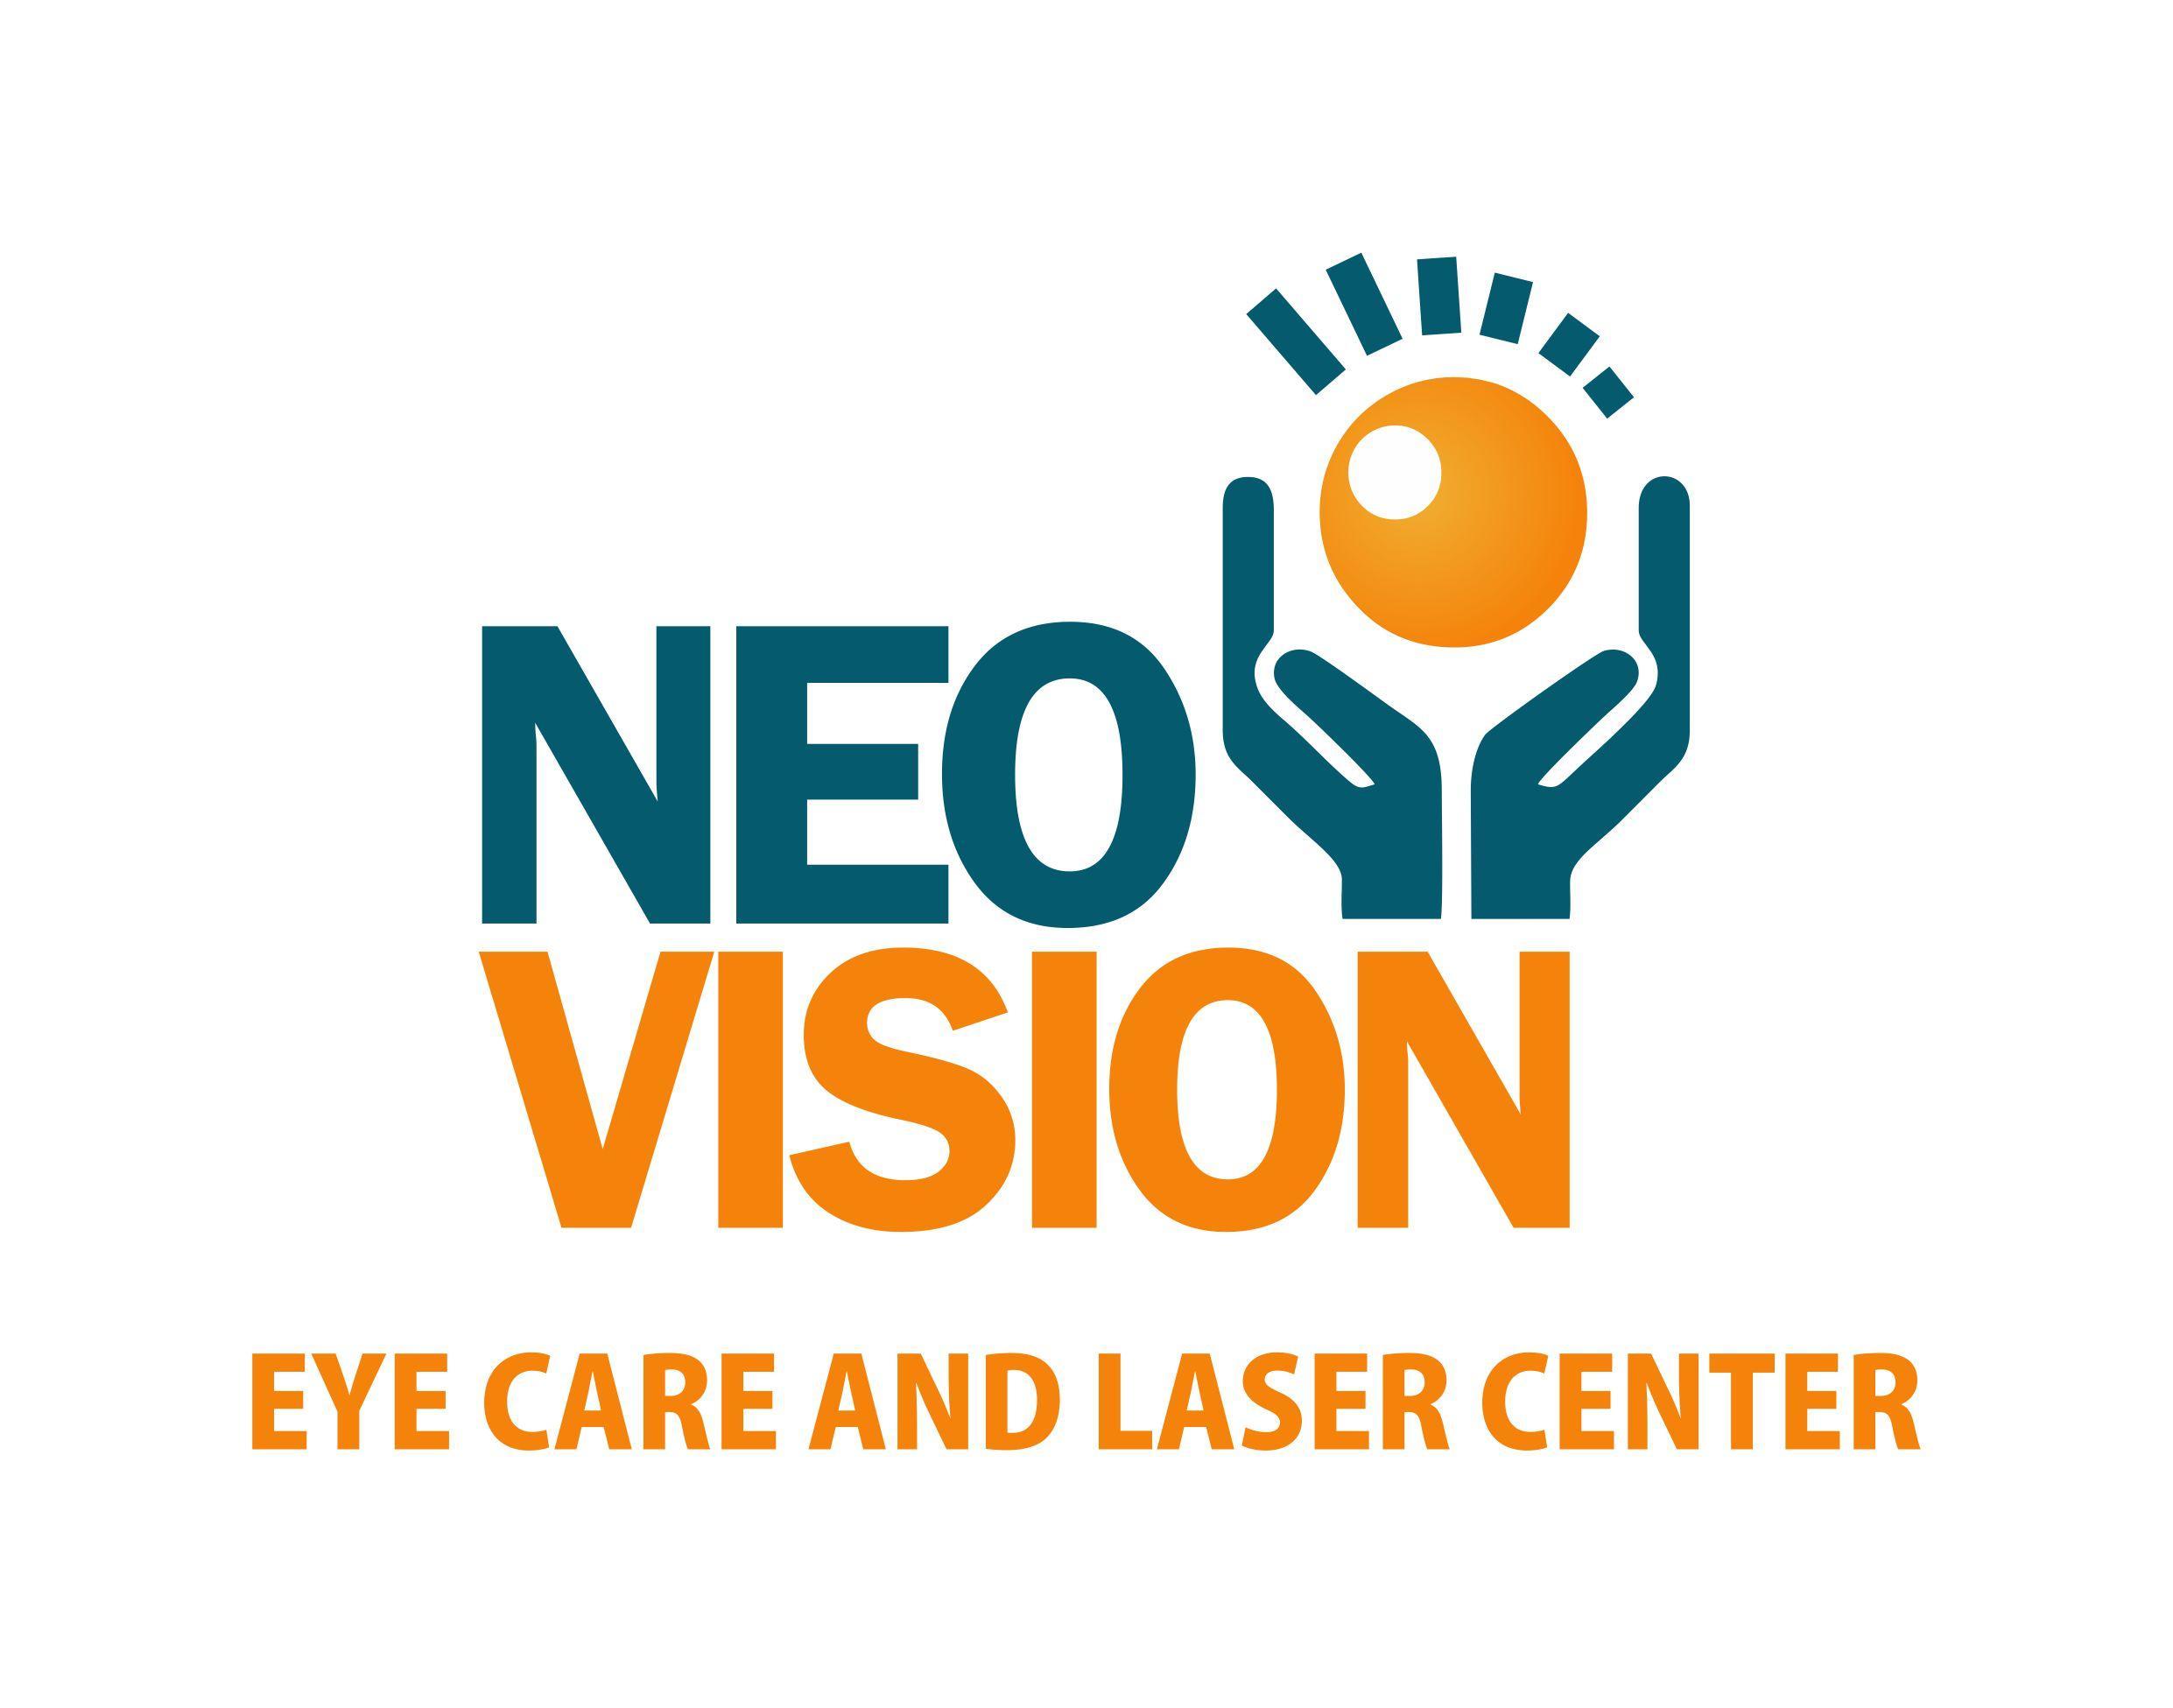 Neo Vision Eye Care & Laser Center